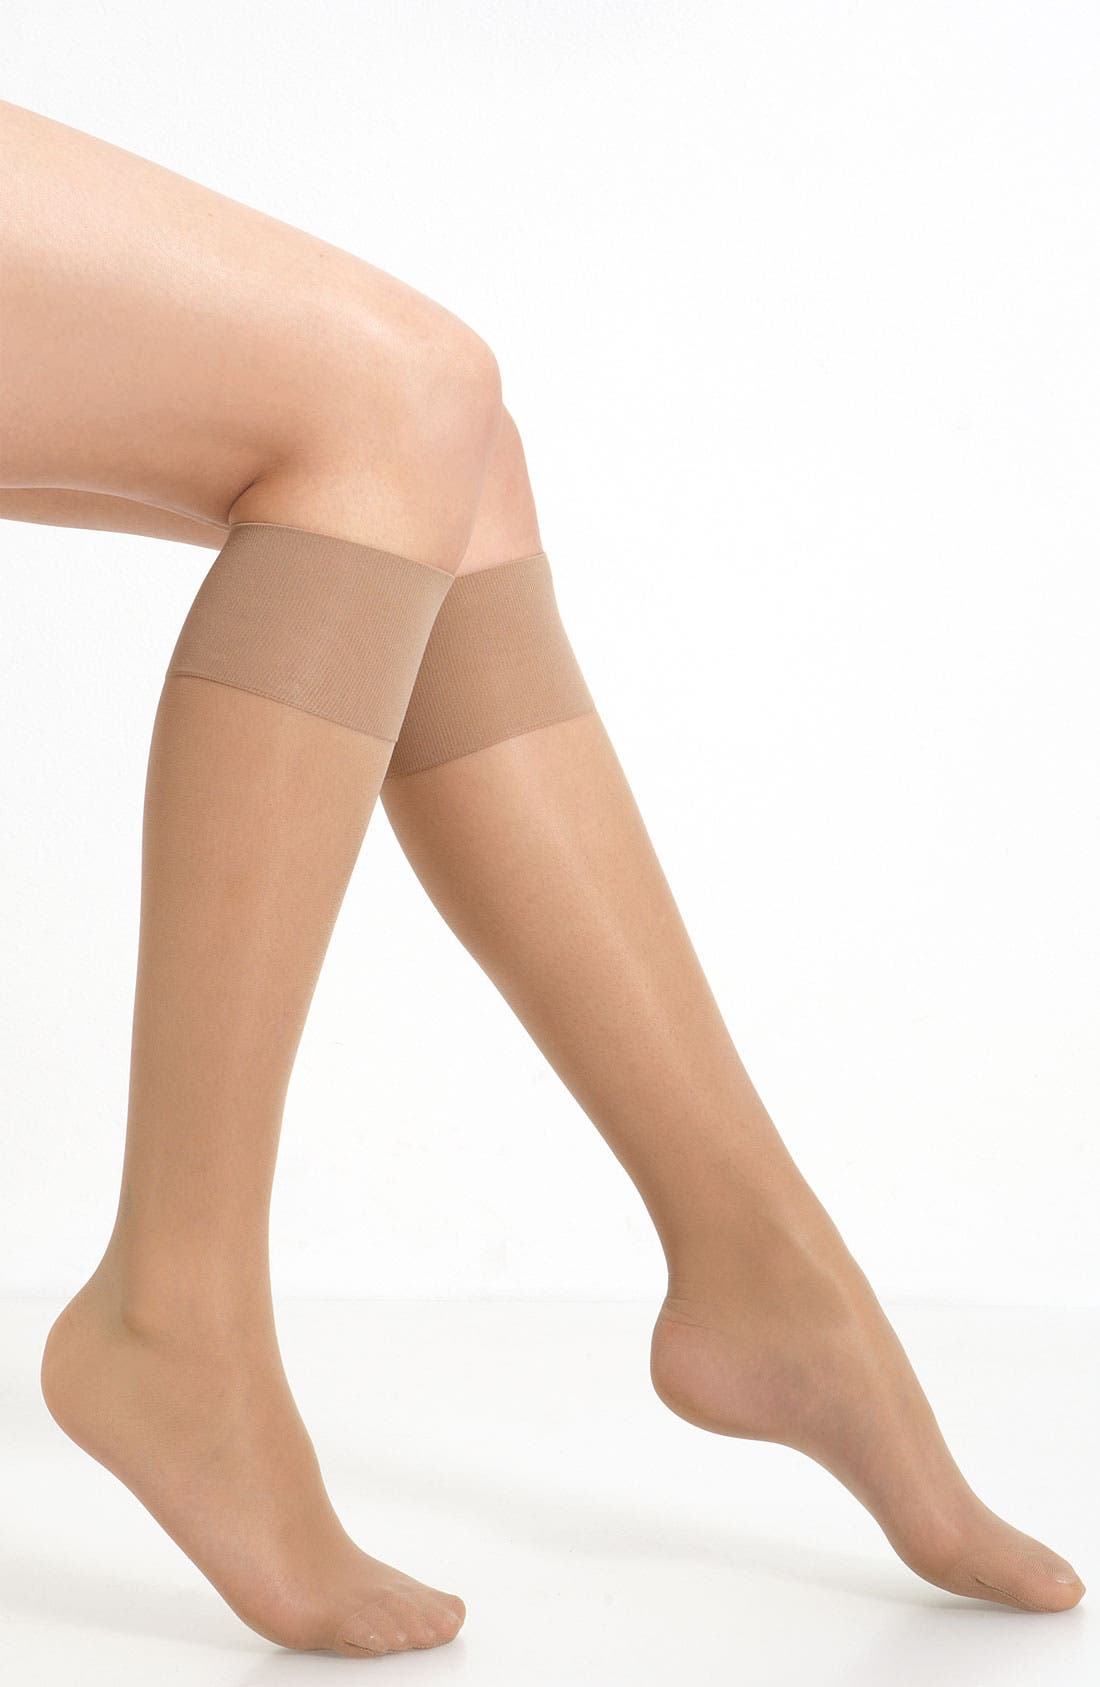 'Mi-Bas Repos 70' Sheer Support Knee Highs,                             Main thumbnail 1, color,                             Nude